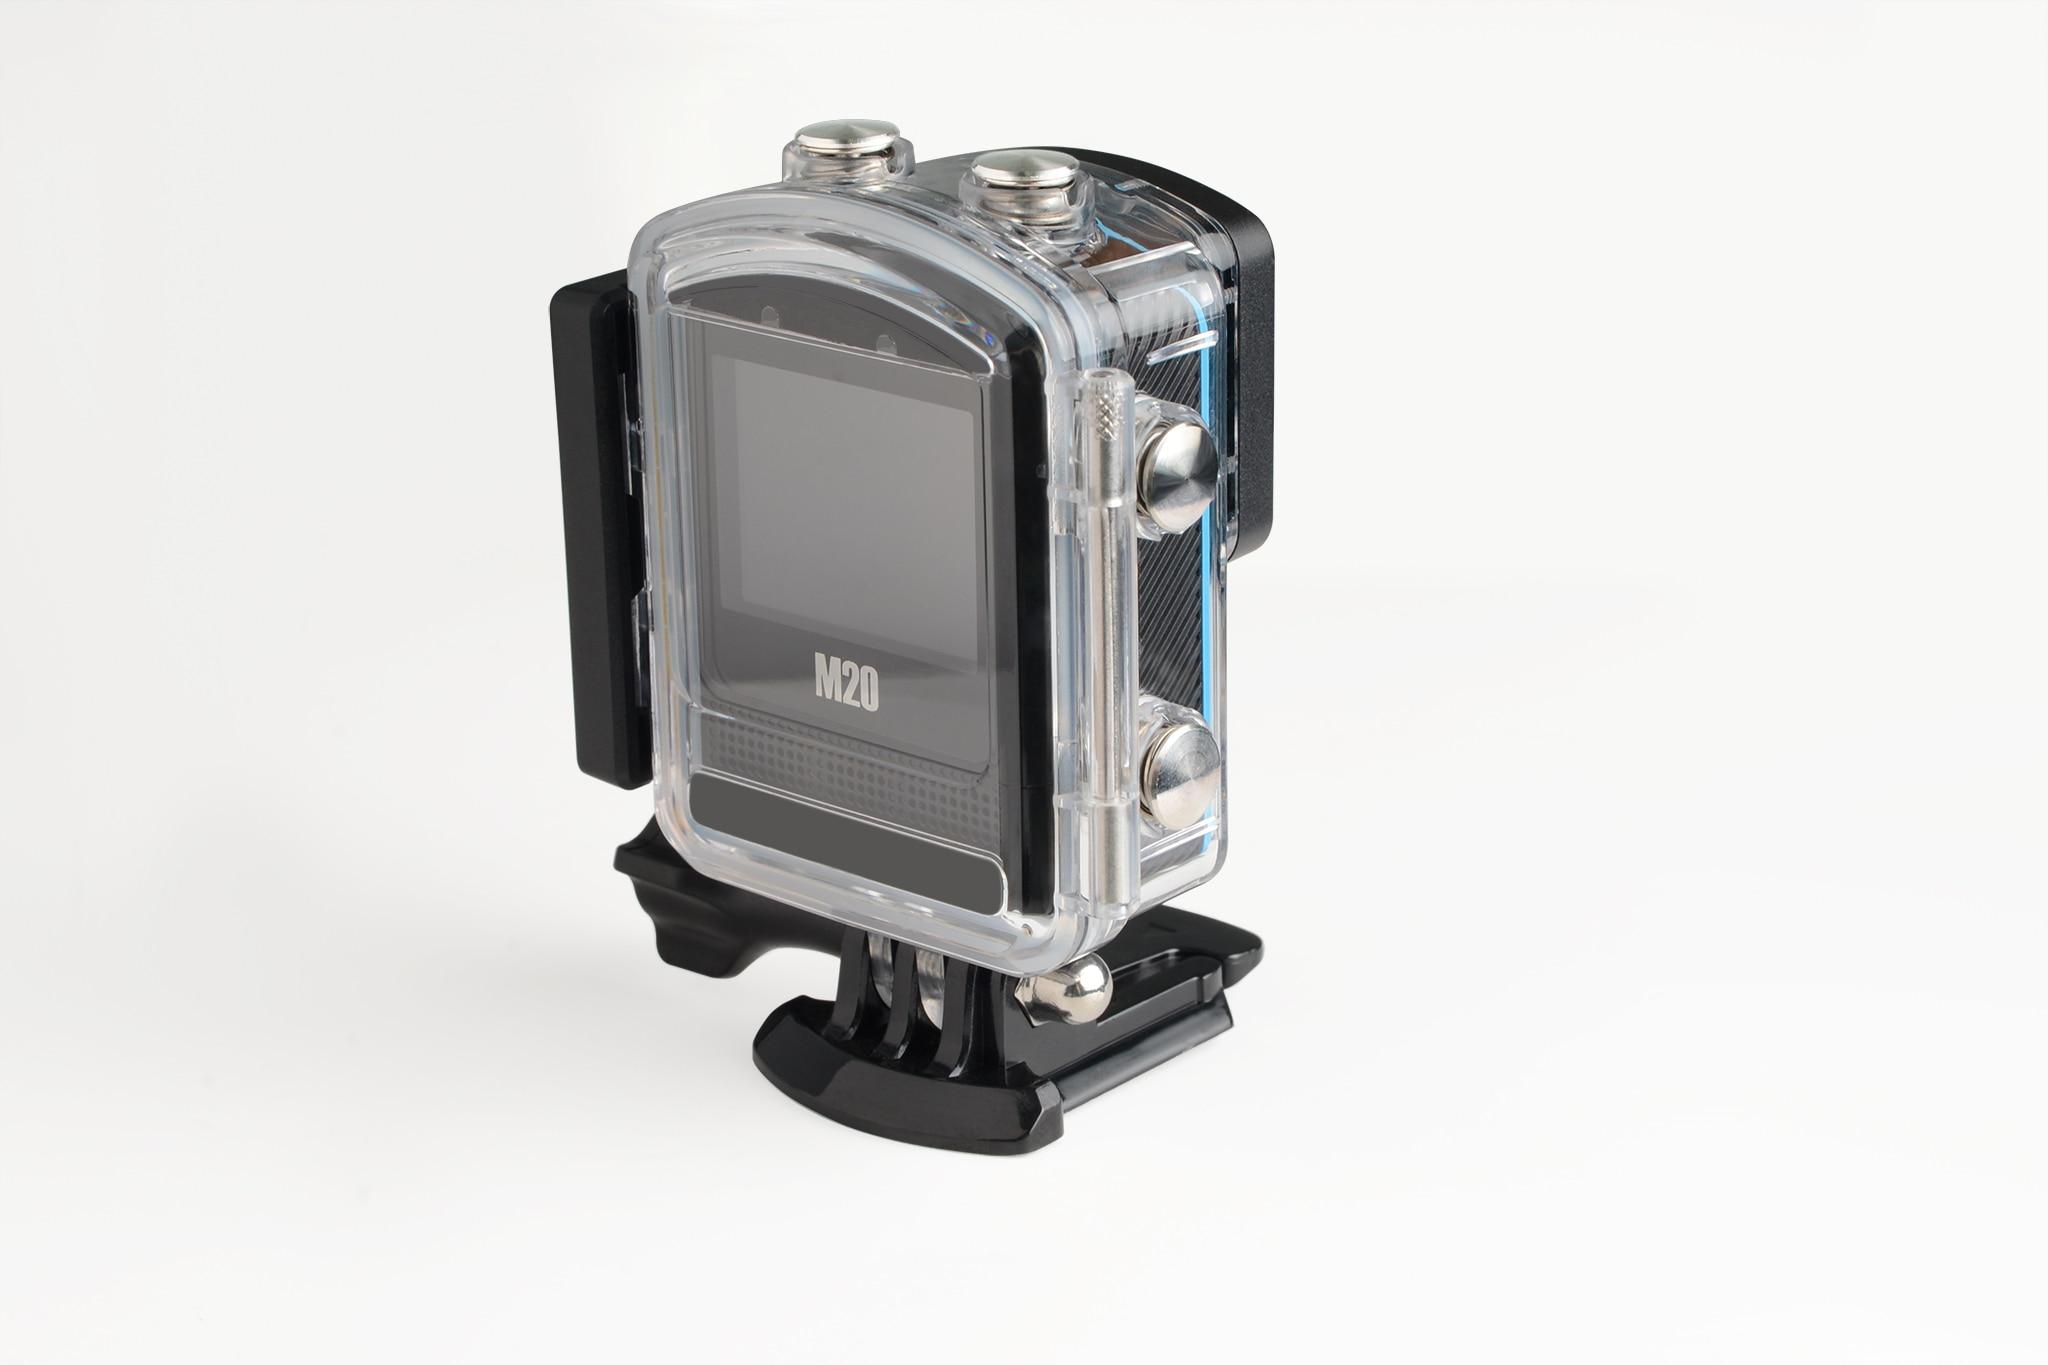 M20 Gyro Mini Action Helmet Sports DV Camera